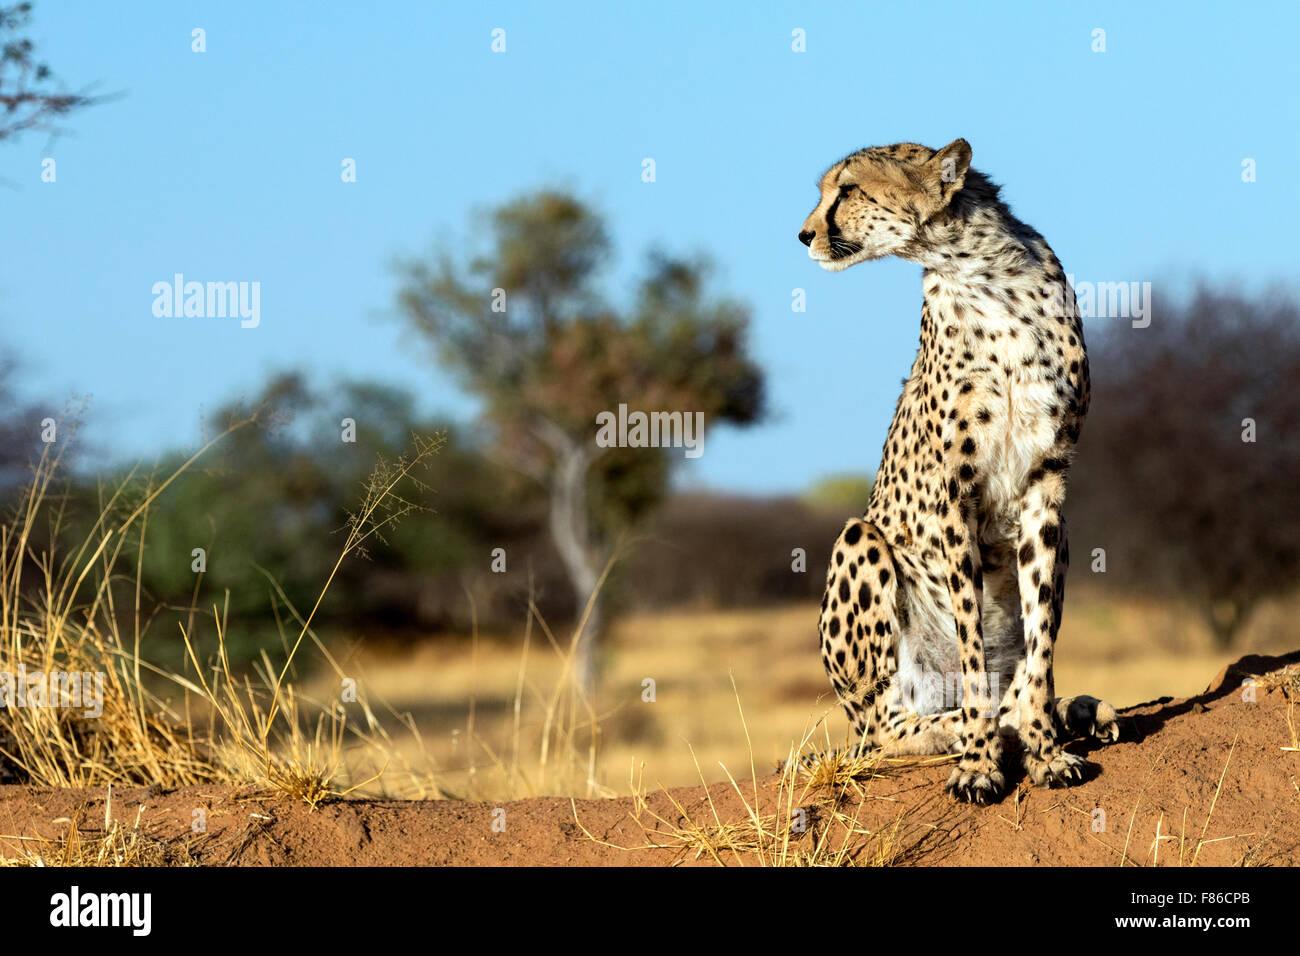 Cheetah (Acinonyx jubatus) [CAPTIVE] - Africat Rehabilitation Sanctuary, Okonjima, Namibia, Africa - Stock Image